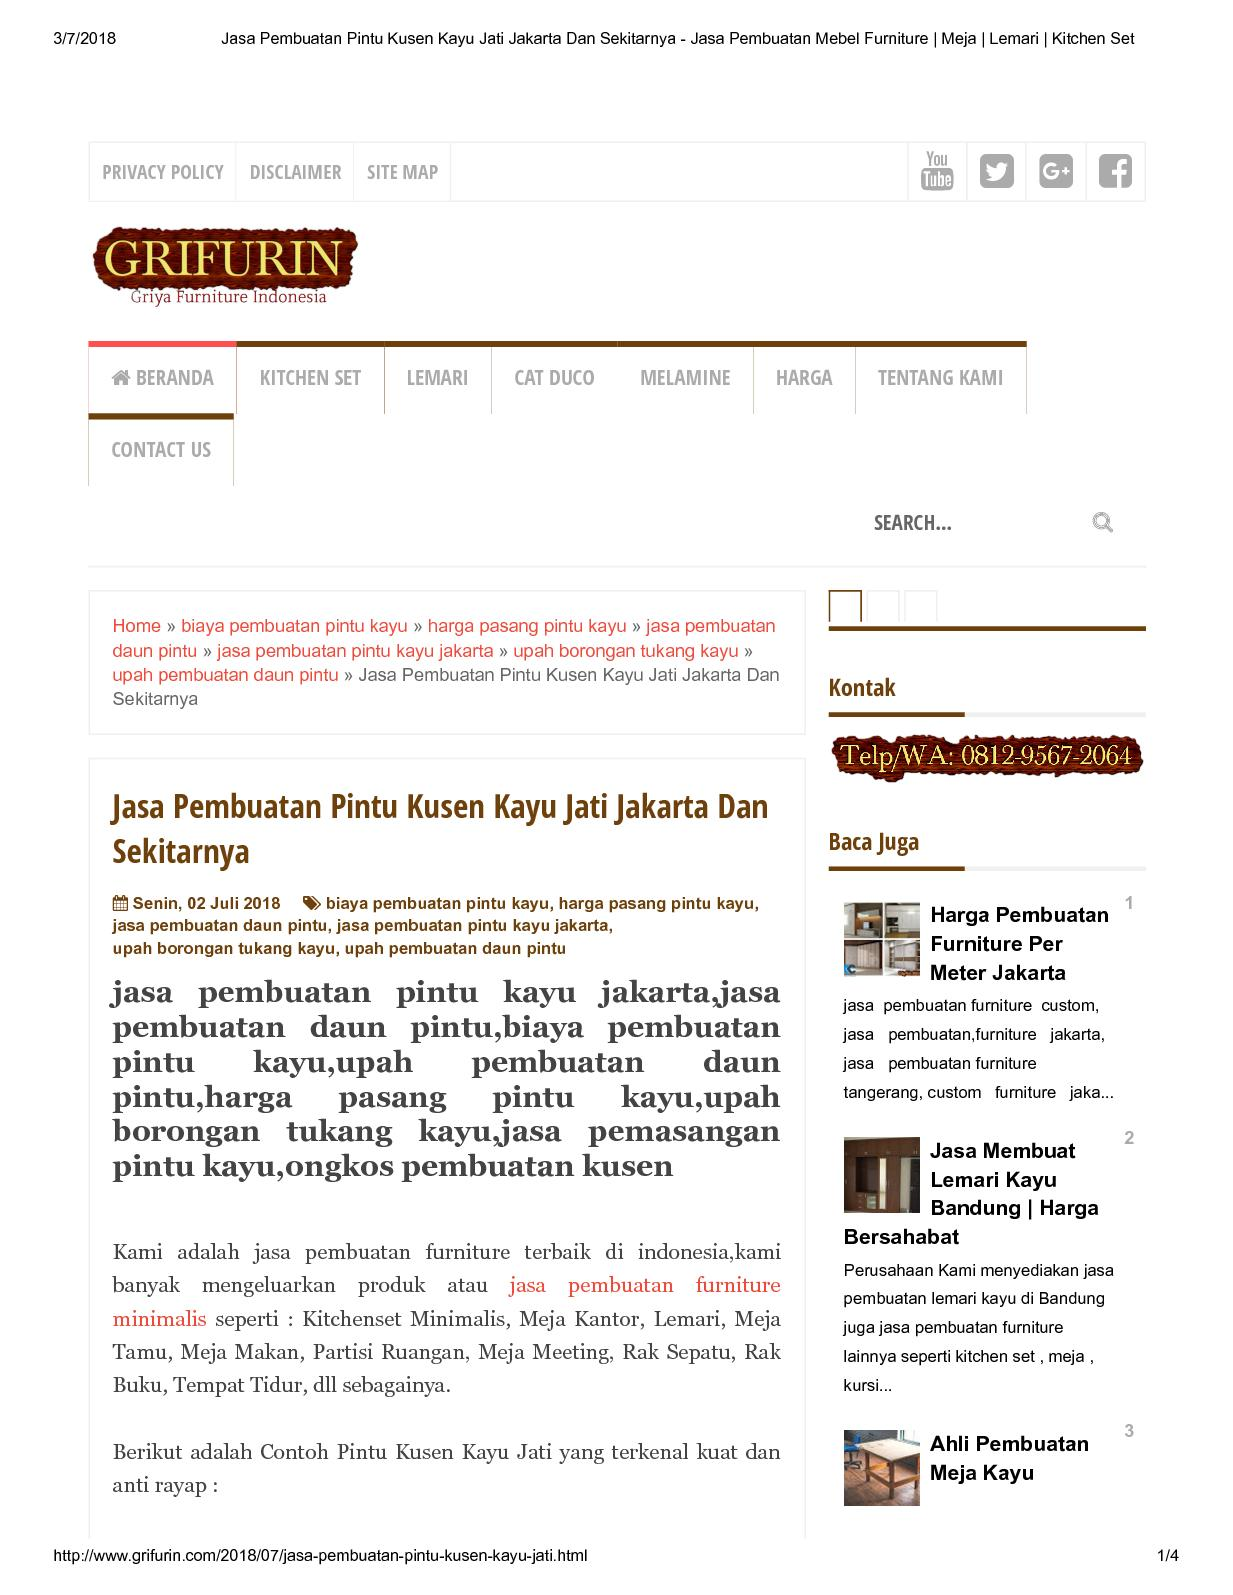 Calaméo Jasa Pembuatan Pintu Kusen Kayu Jati Jakarta Dan